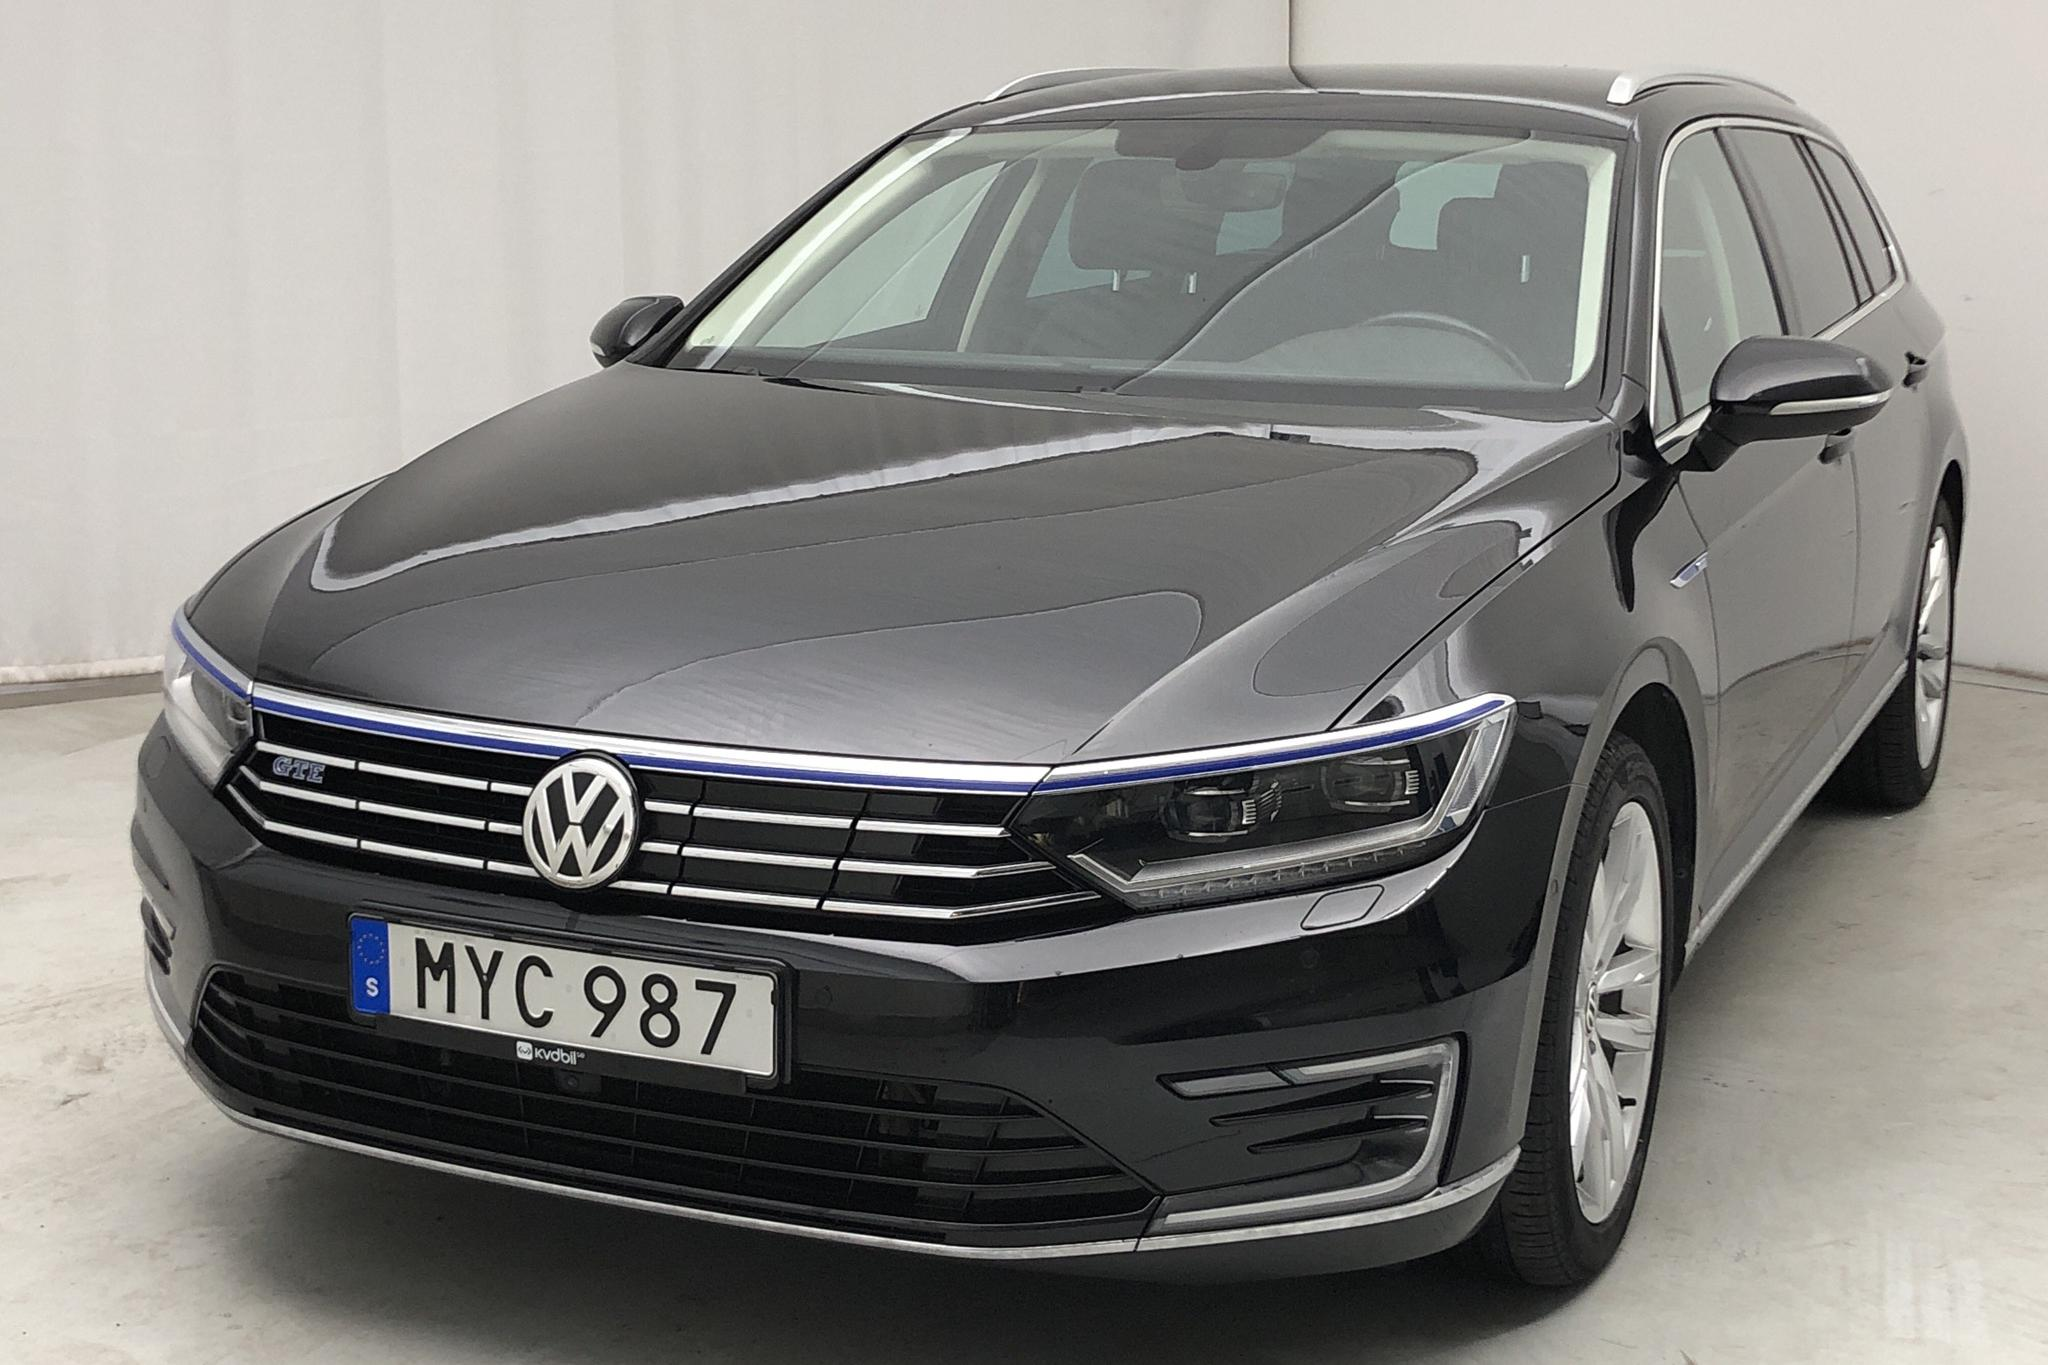 VW Passat 1.4 Plug-in-Hybrid Sportscombi (218hk) - 57 000 km - Automatic - black - 2017